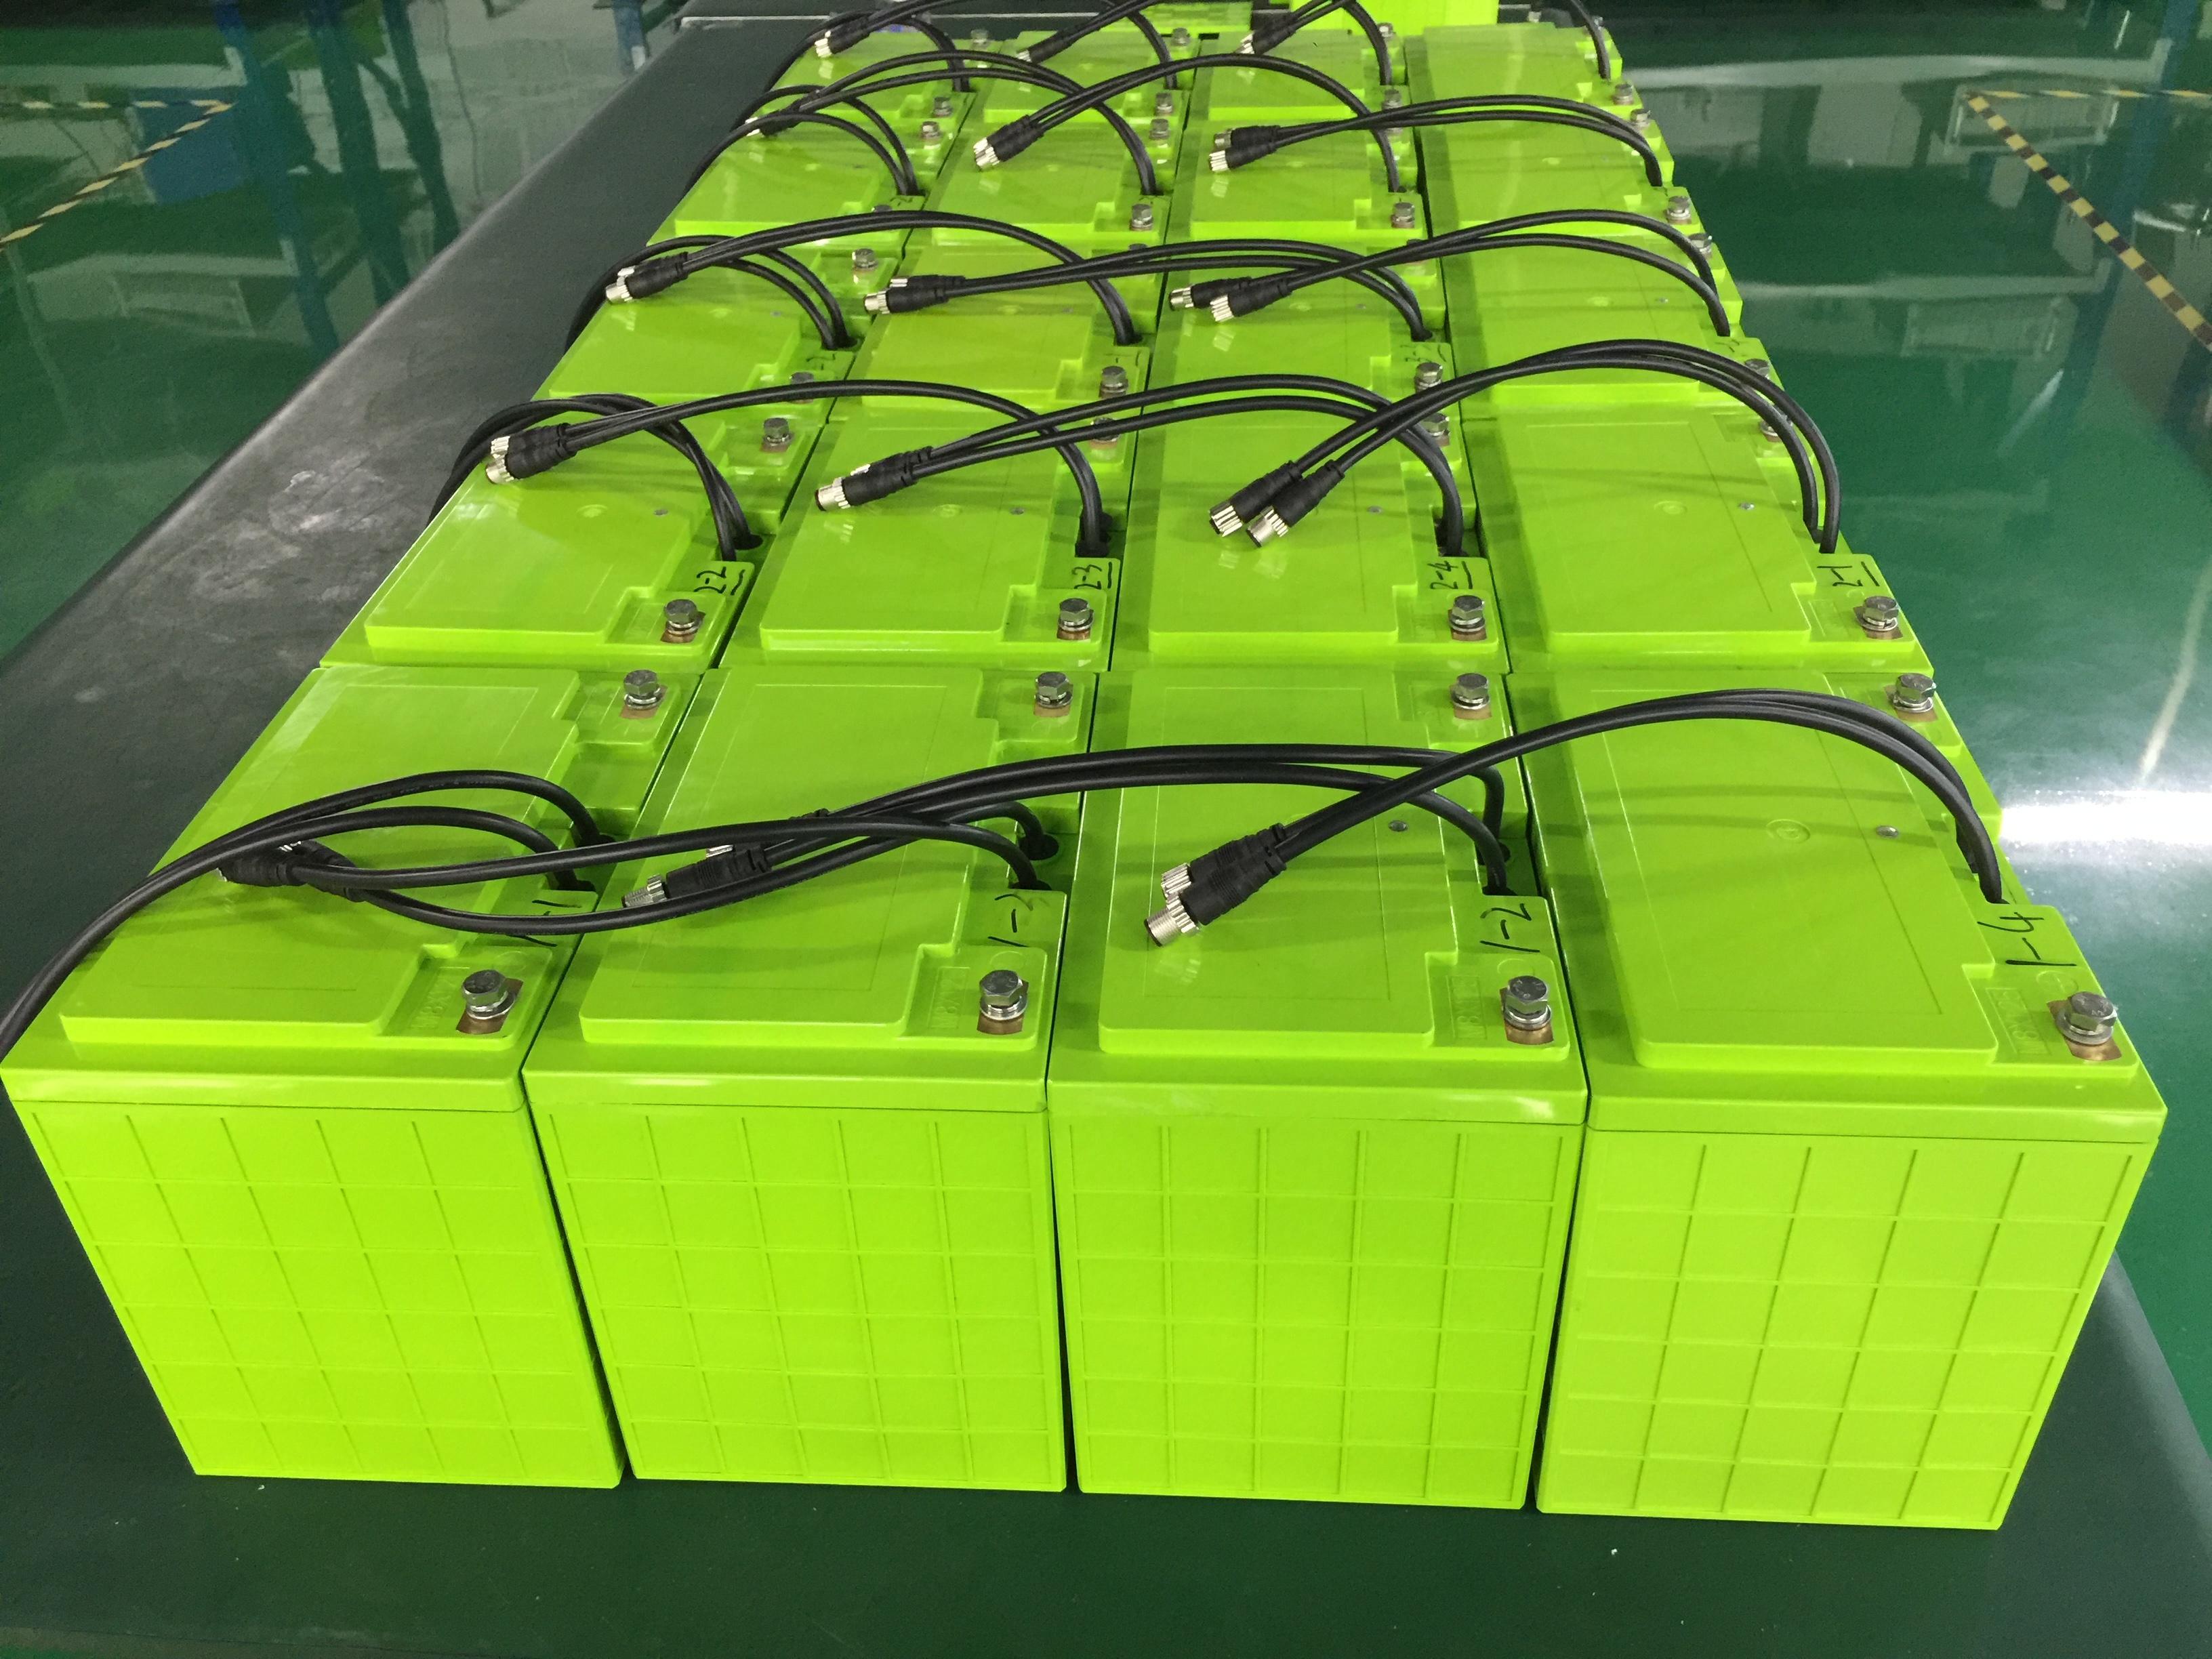 Deep Cycle 18650 Li Ion Battery Pack Lifepo4 12v 24v 48v 50ah 60ah 100ah 200ah Lithium Battery Pack For Rv 12v Solar System Buy 24v 200ah Battery 48v 200ah Batterie 48v Lifepo4 200ah